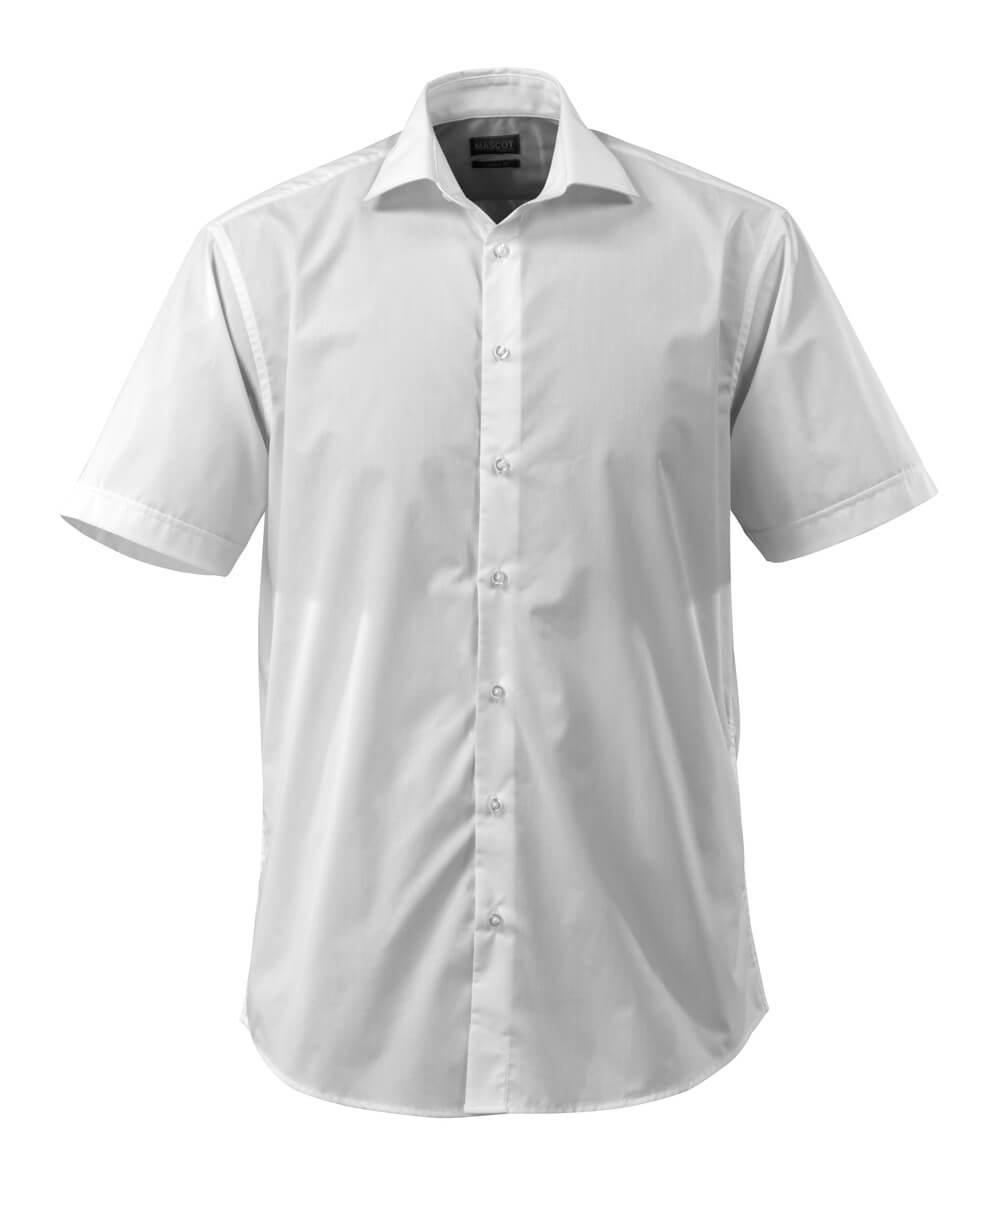 50632-984-06 Hemd, Kurzarm - Weiß